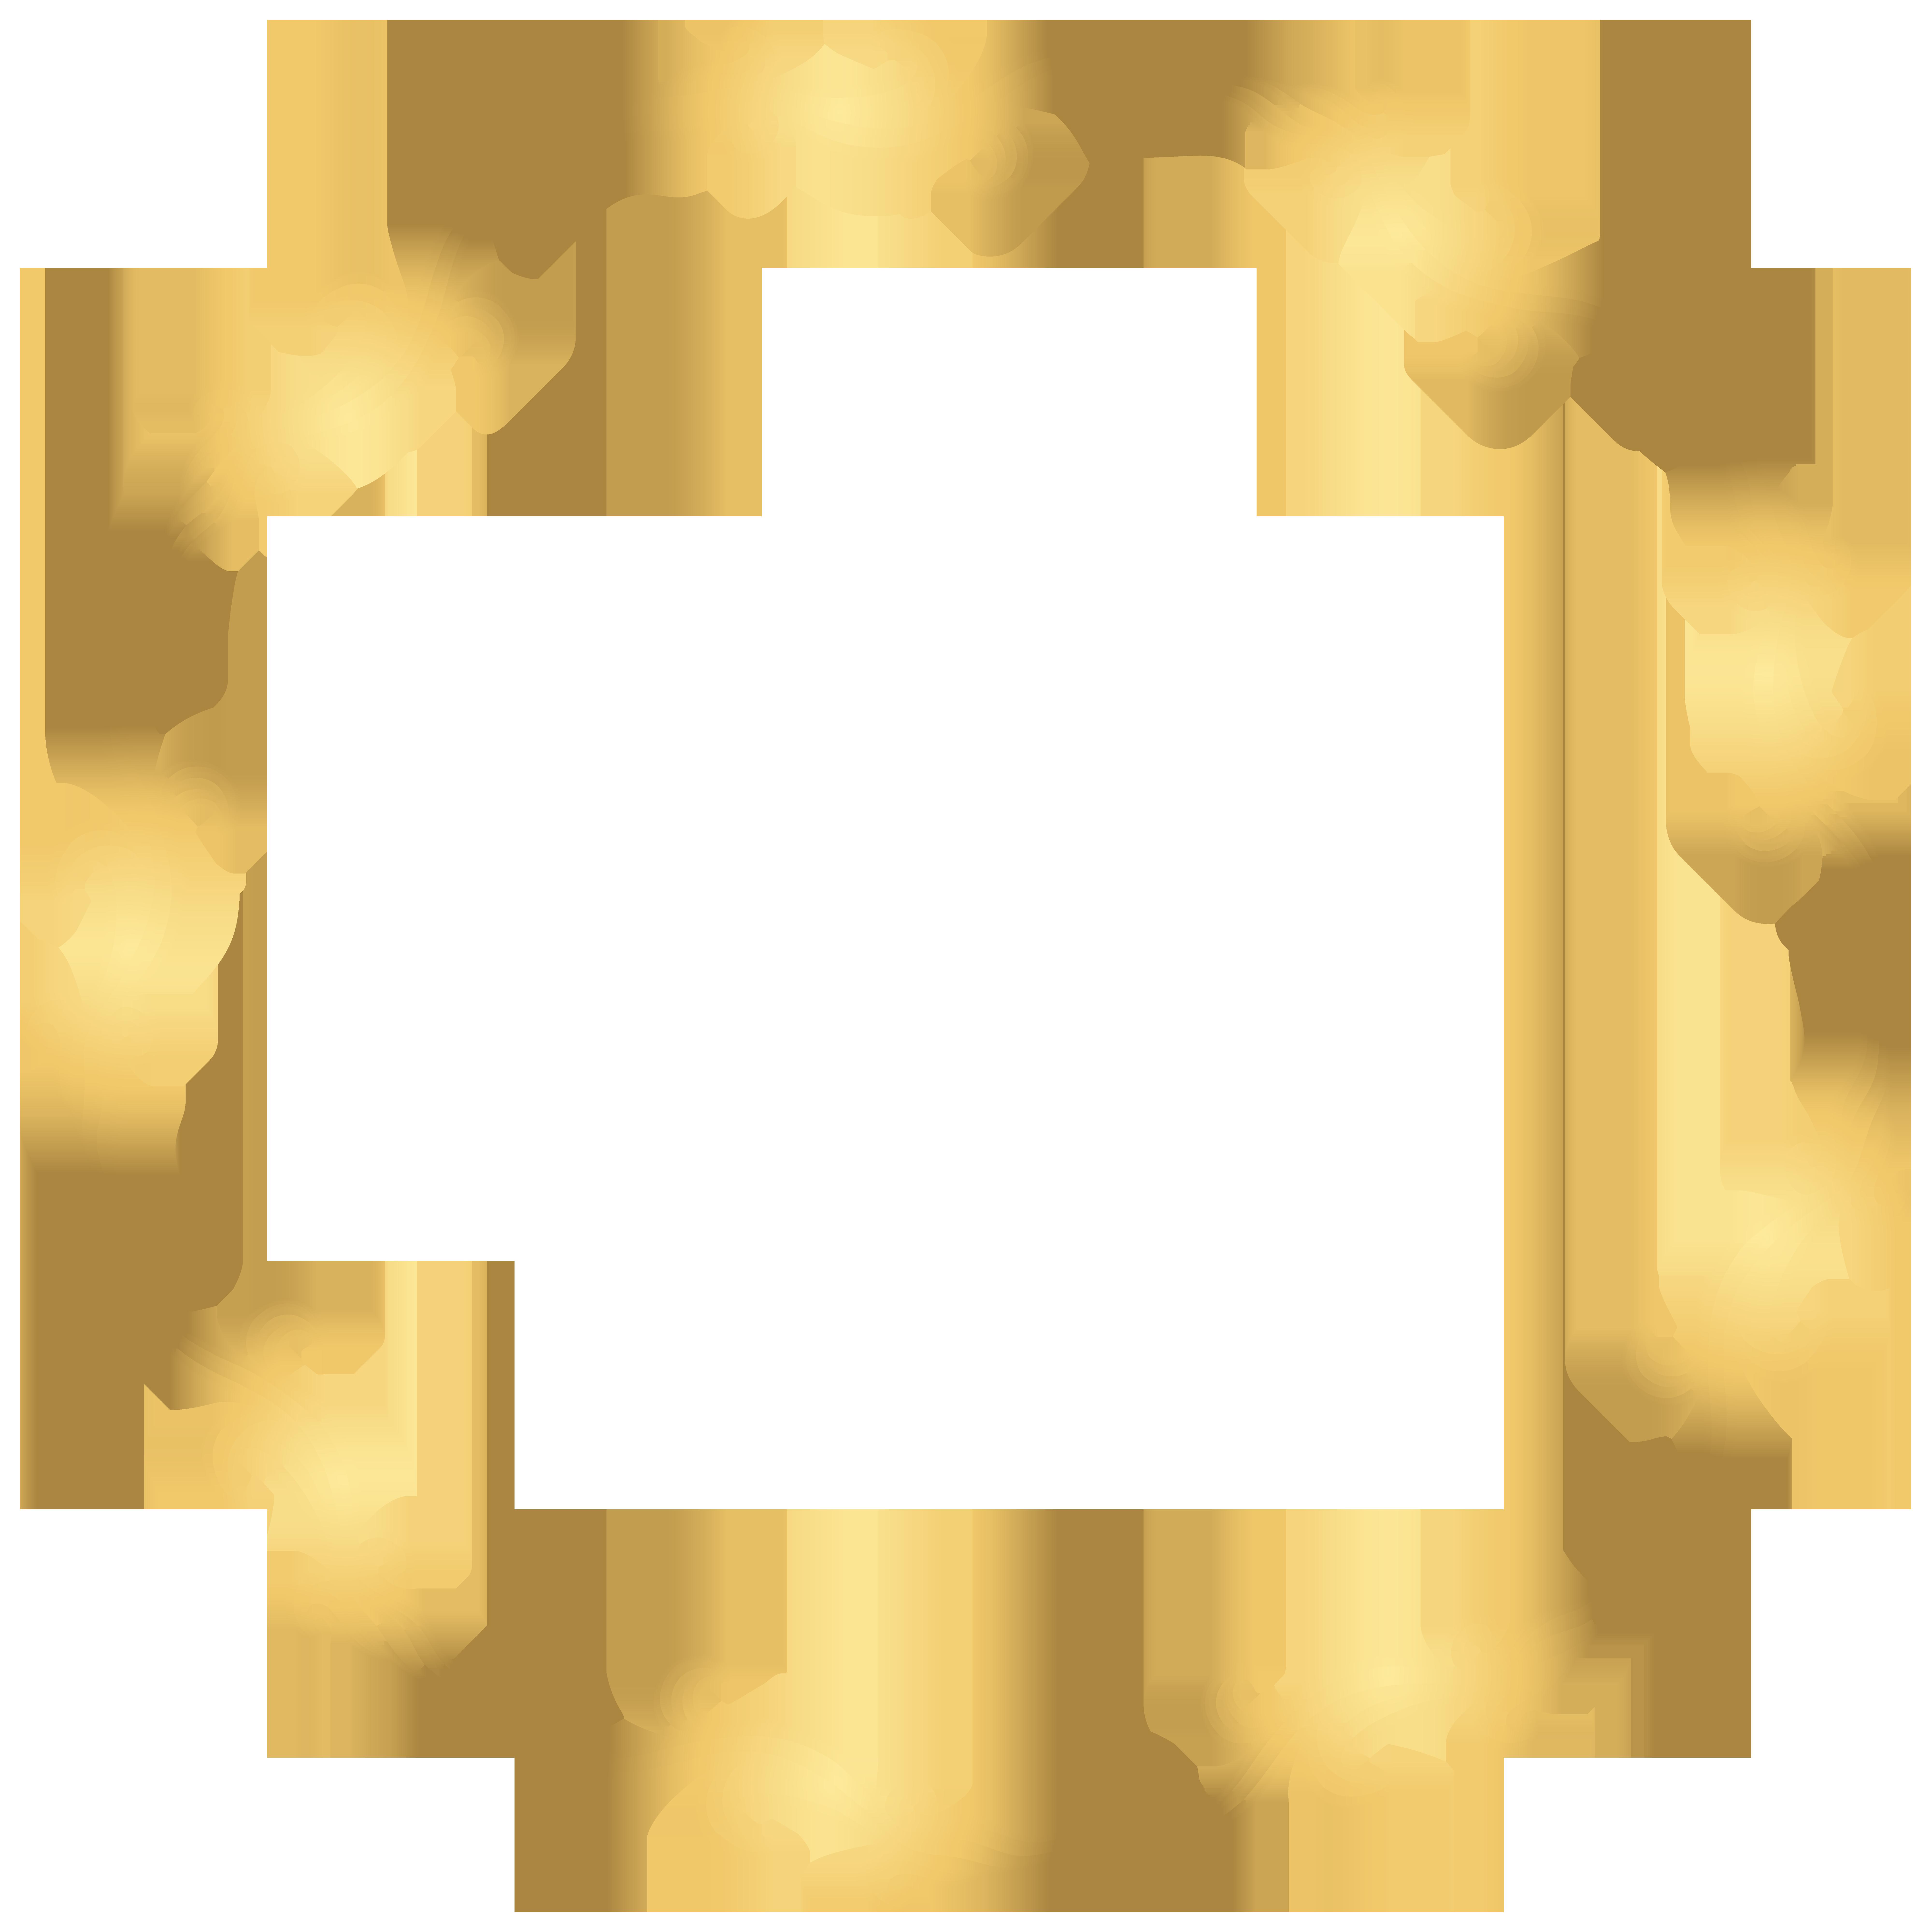 Floral Gold Round Border PNG Transparent Clip Art Image.